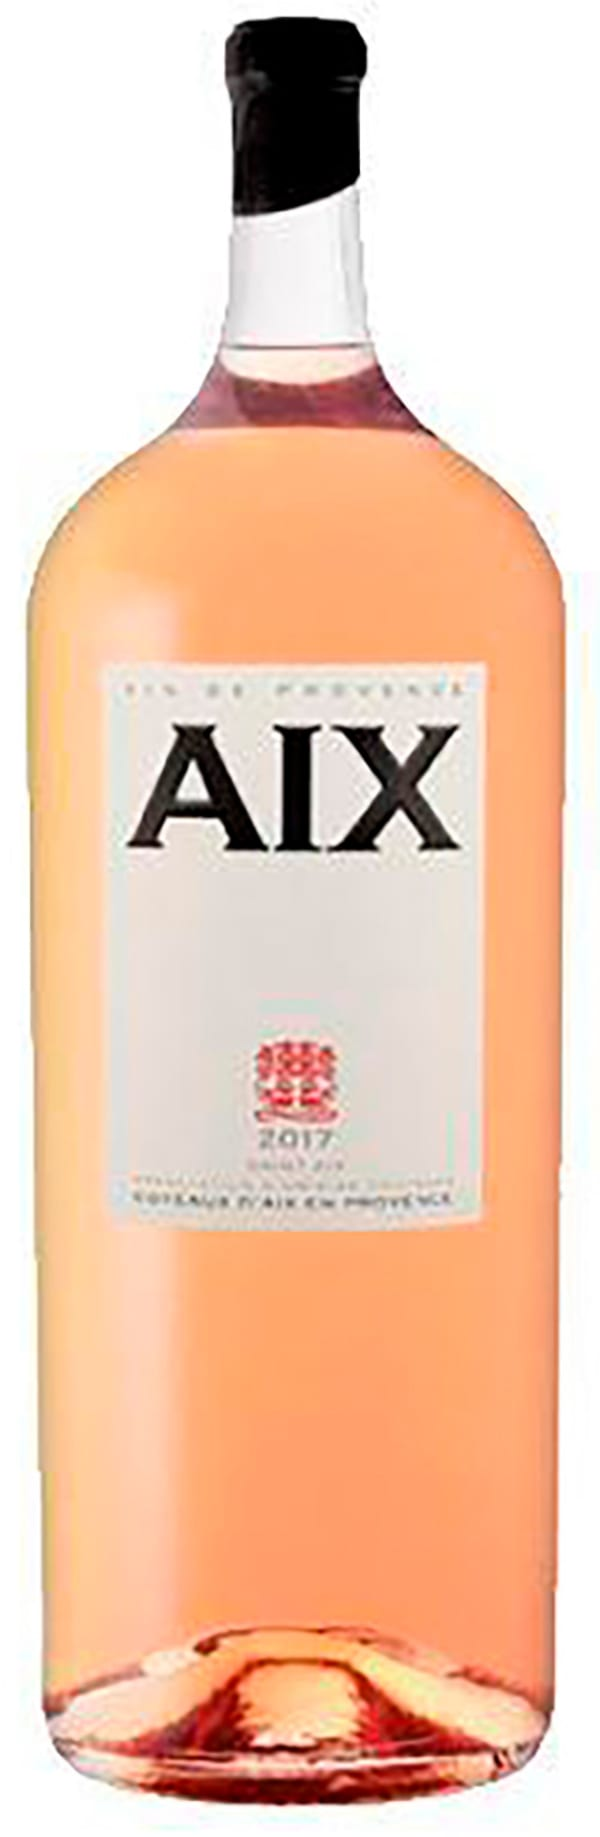 Aix Provence Rosé Mathusalem 2019